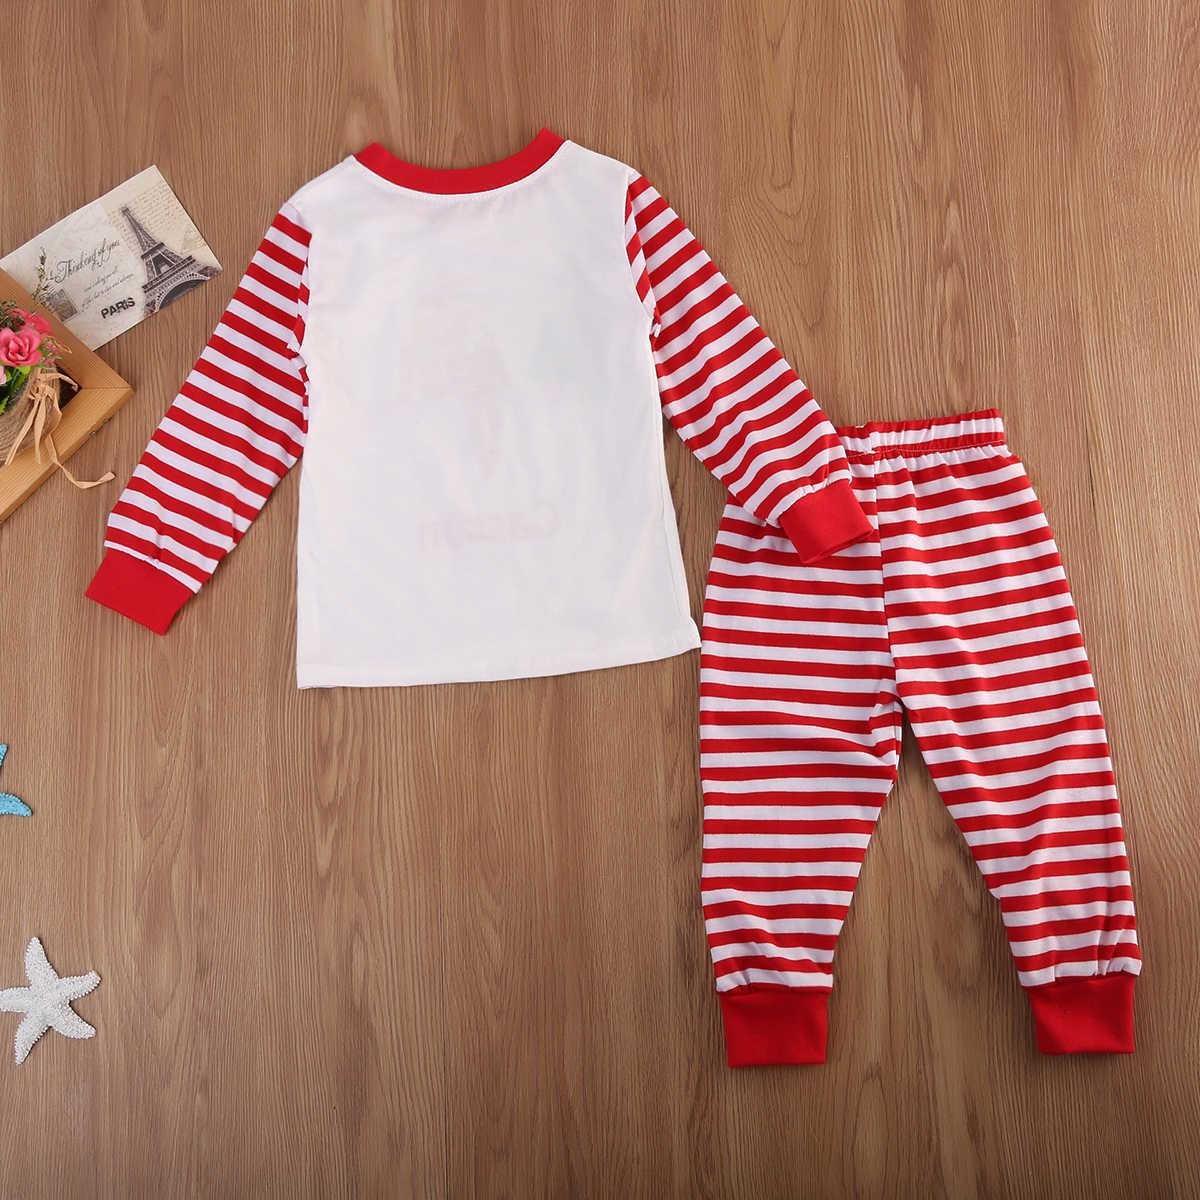 ... Family Matching Christmas Winter Warm Pajamas Sets Adult Kids Xmas Cute  Santa Letter Printing Stripe Sleepwear ... dbdf9b354